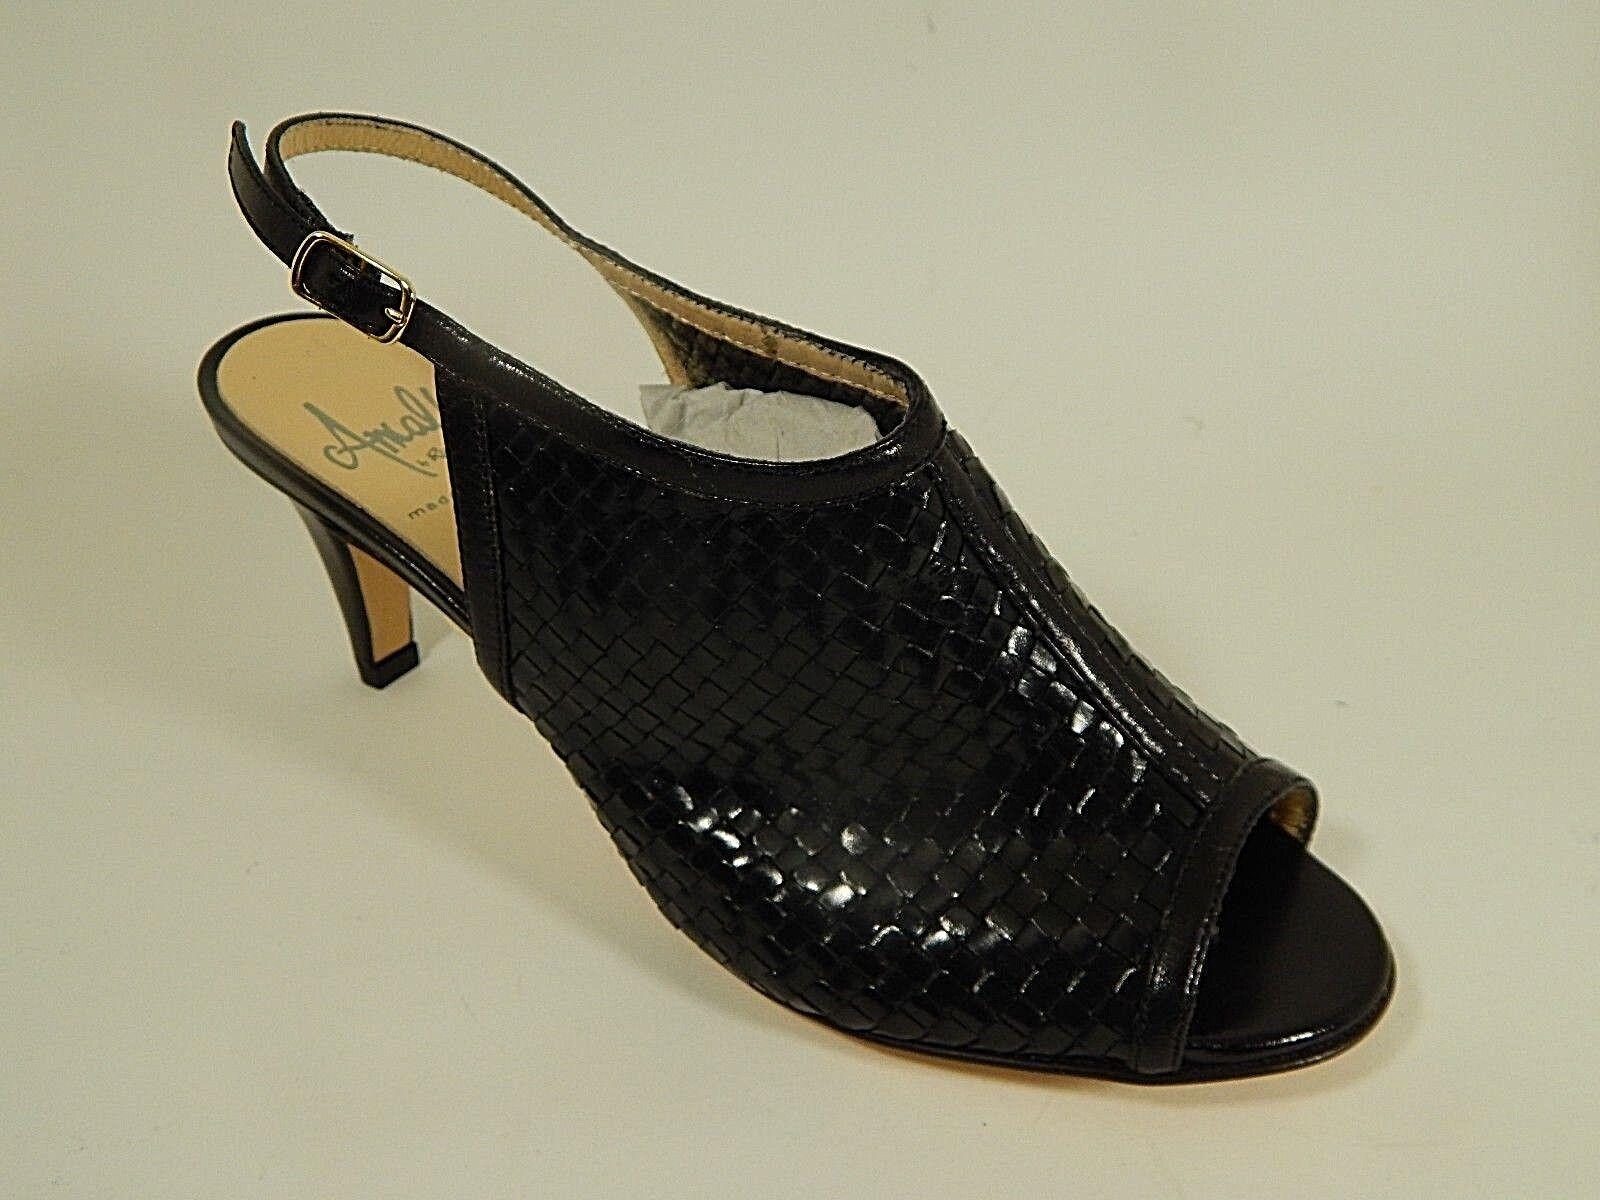 Amalfi Black woven Leather Heels Sandals Mules Slingback Open Toe 7 M